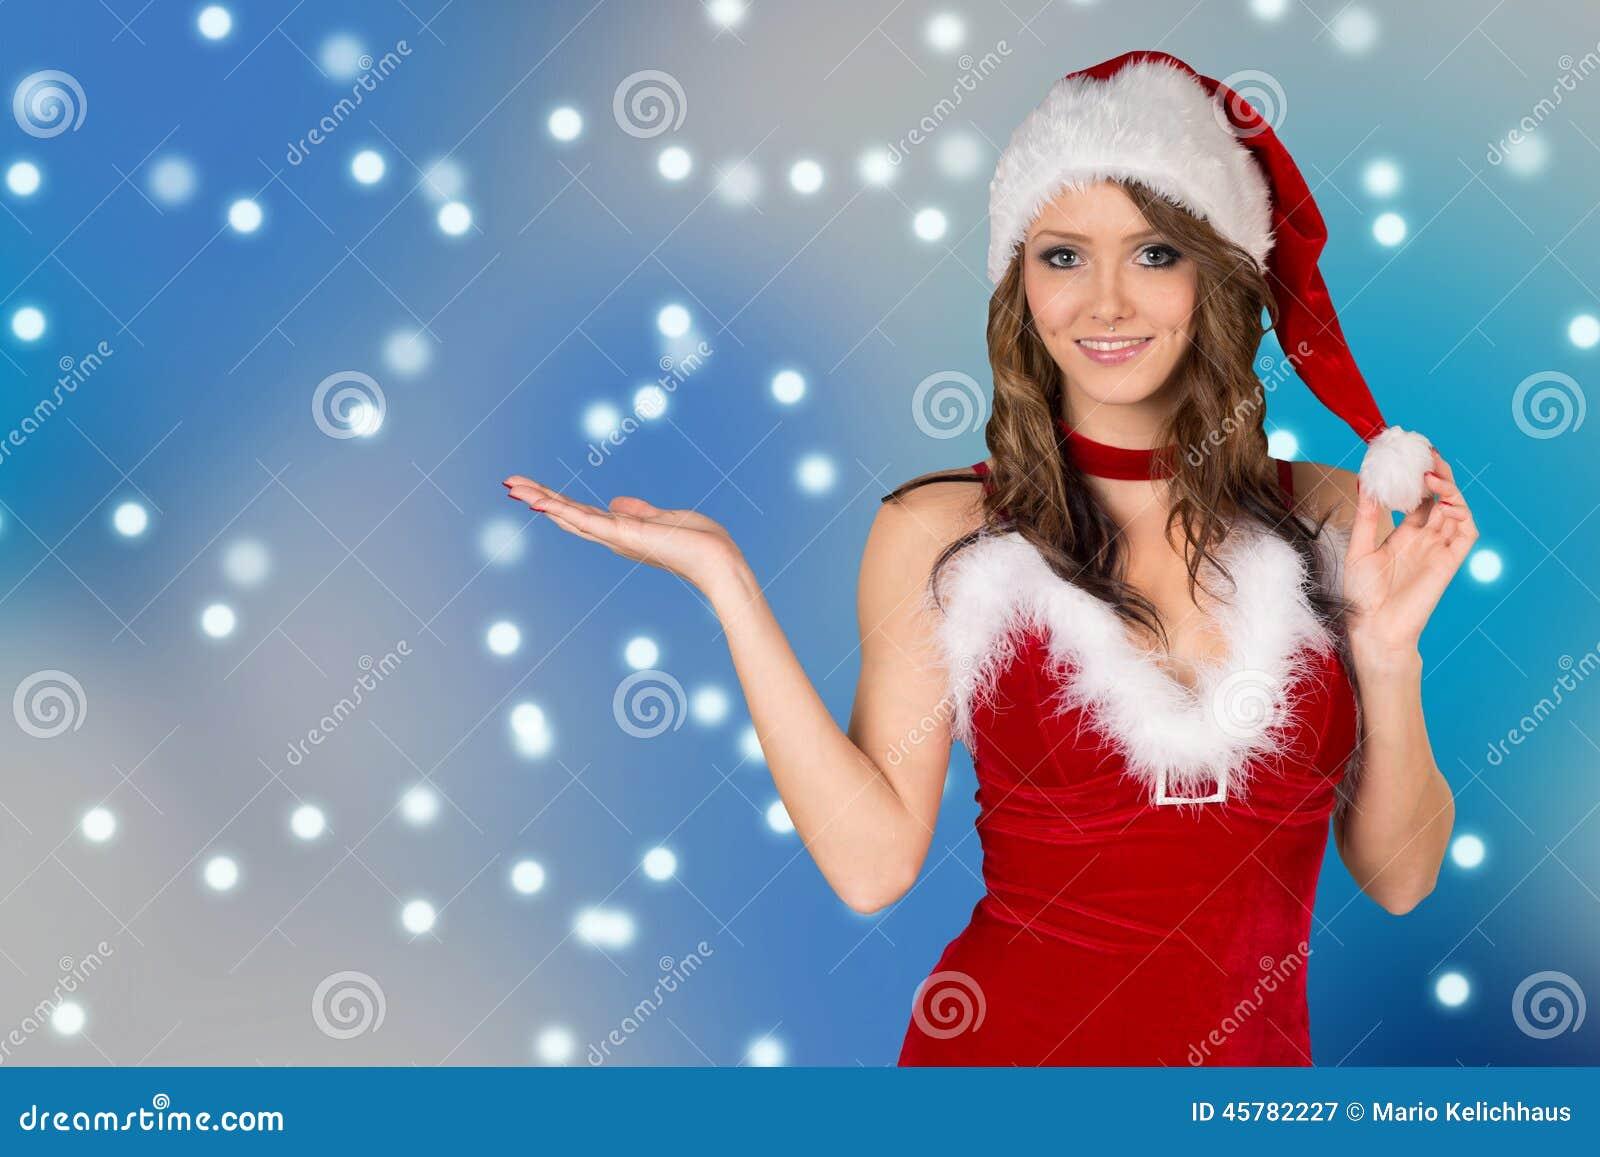 christmas stock photo image 45782227. Black Bedroom Furniture Sets. Home Design Ideas